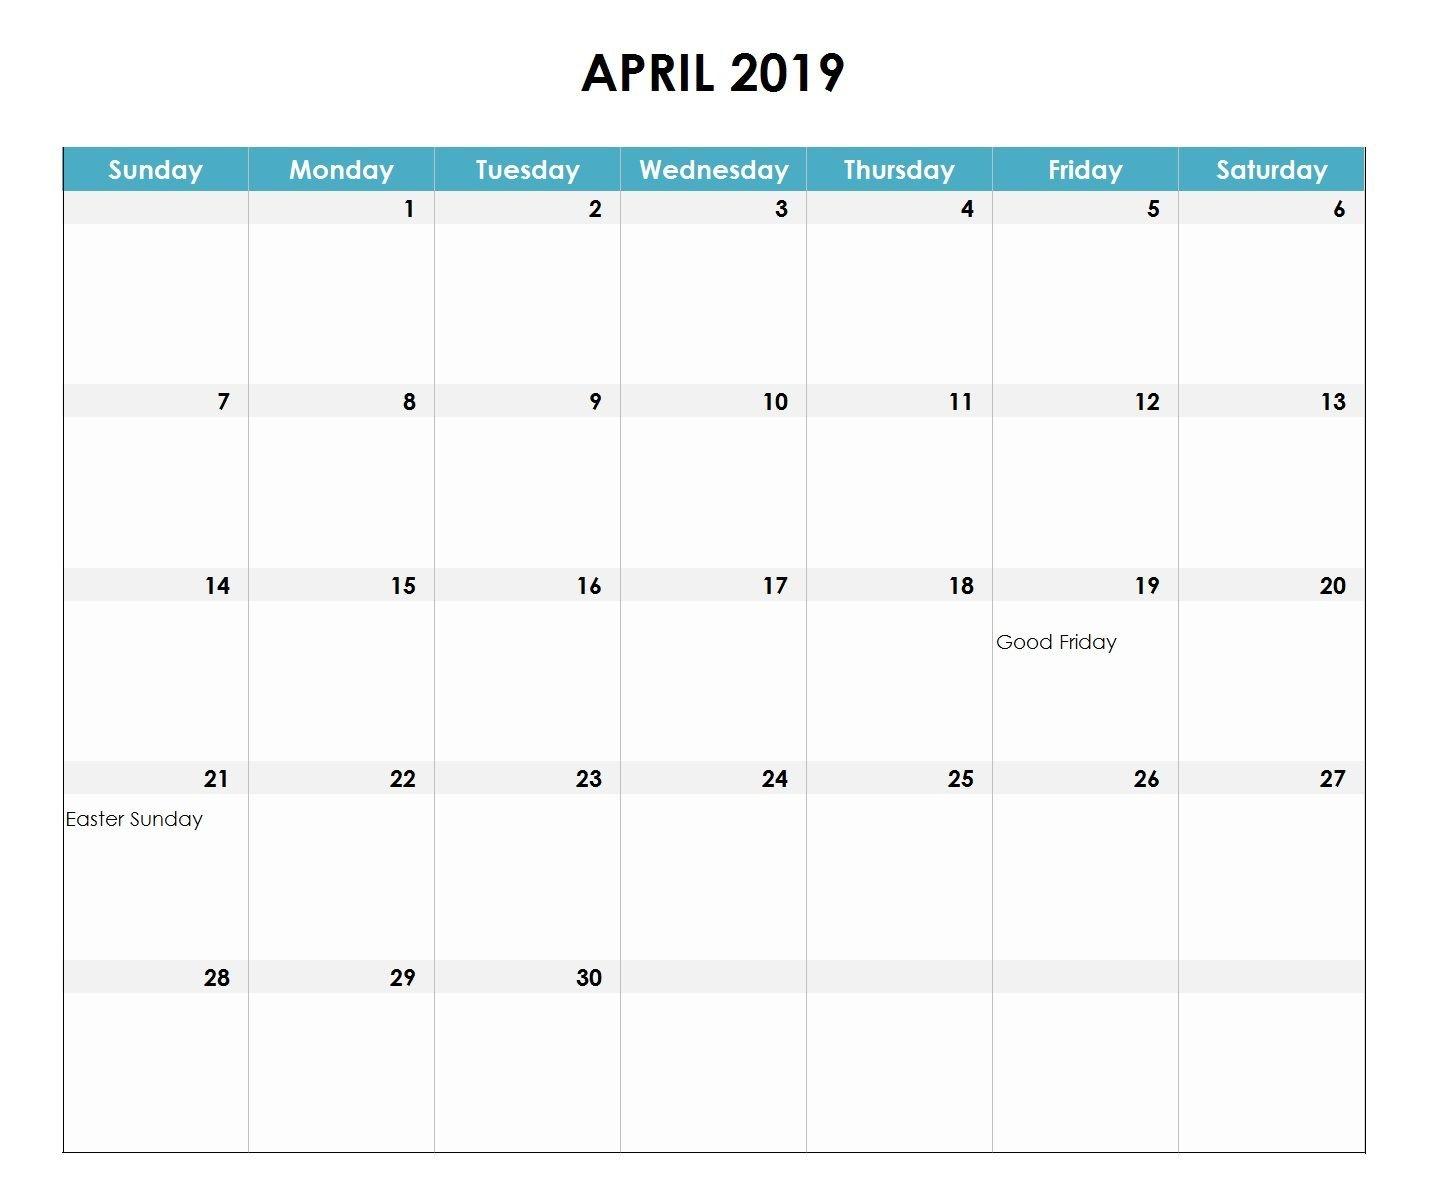 April 2019 Excel Calendar | Monthly Calendar Templates | Excel Calendar 2019 Excel Canada